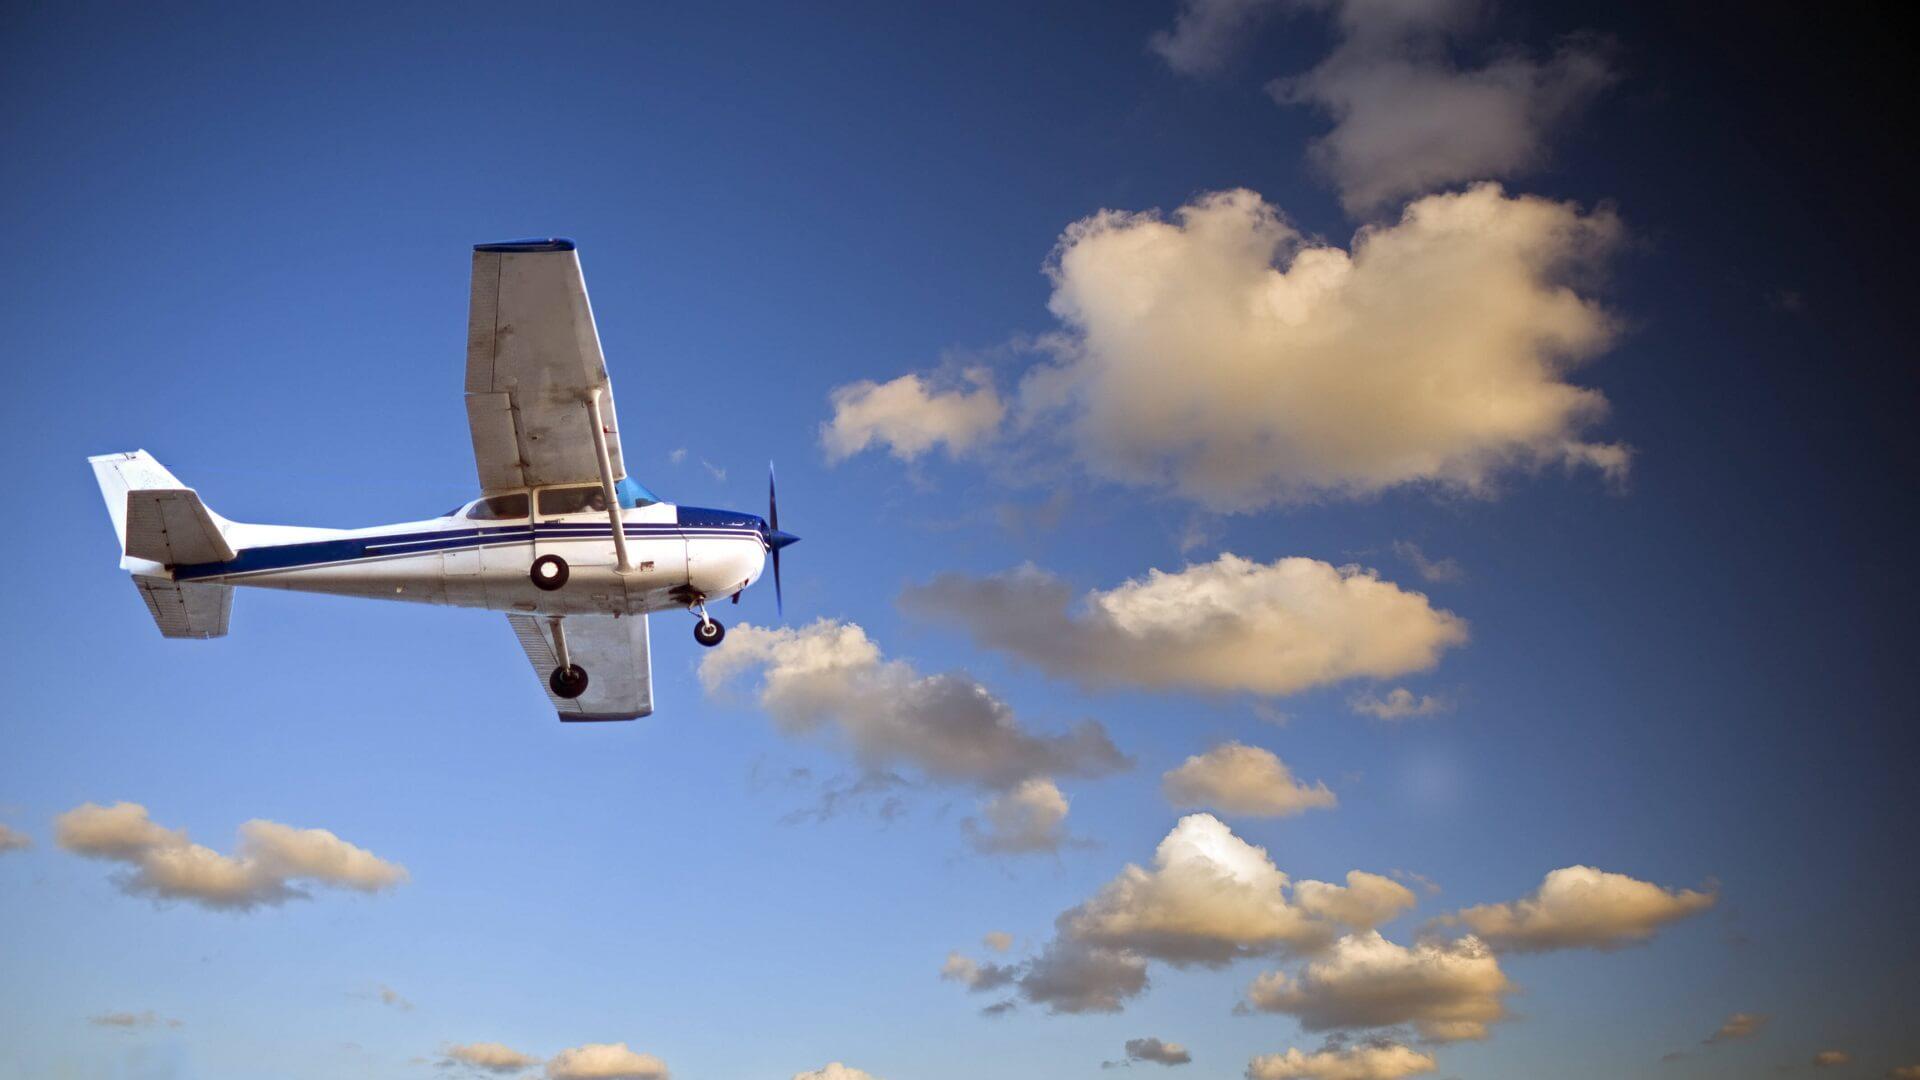 Loty widokowe samolotem